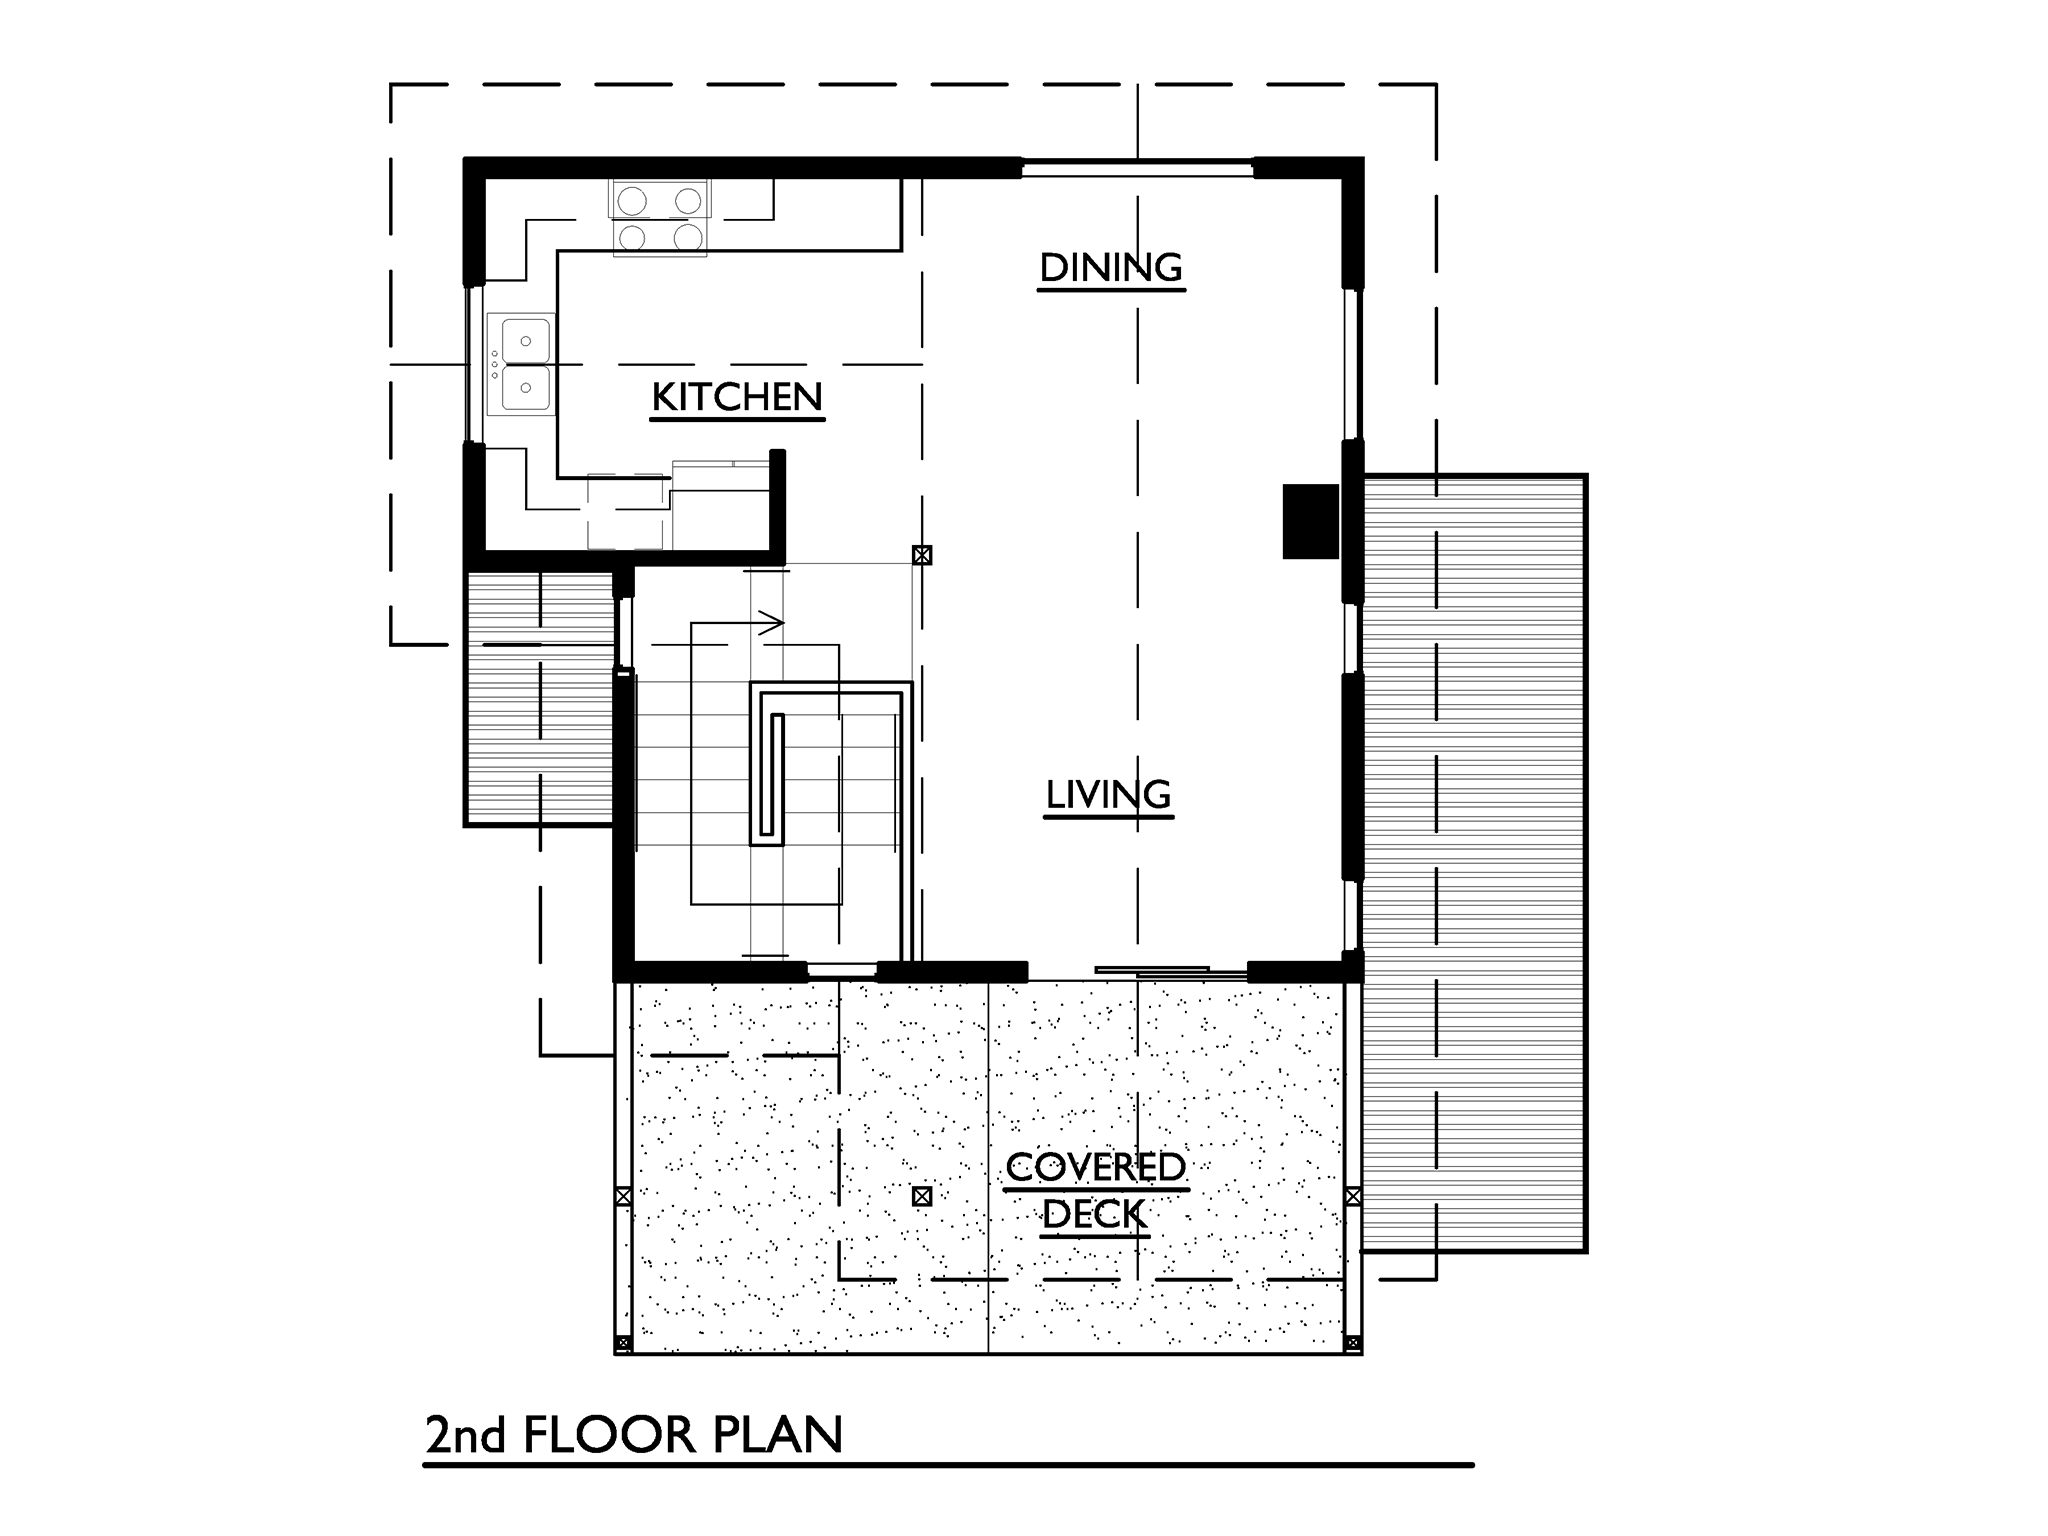 cottage 2 storey 2 bedrooms plan (6)